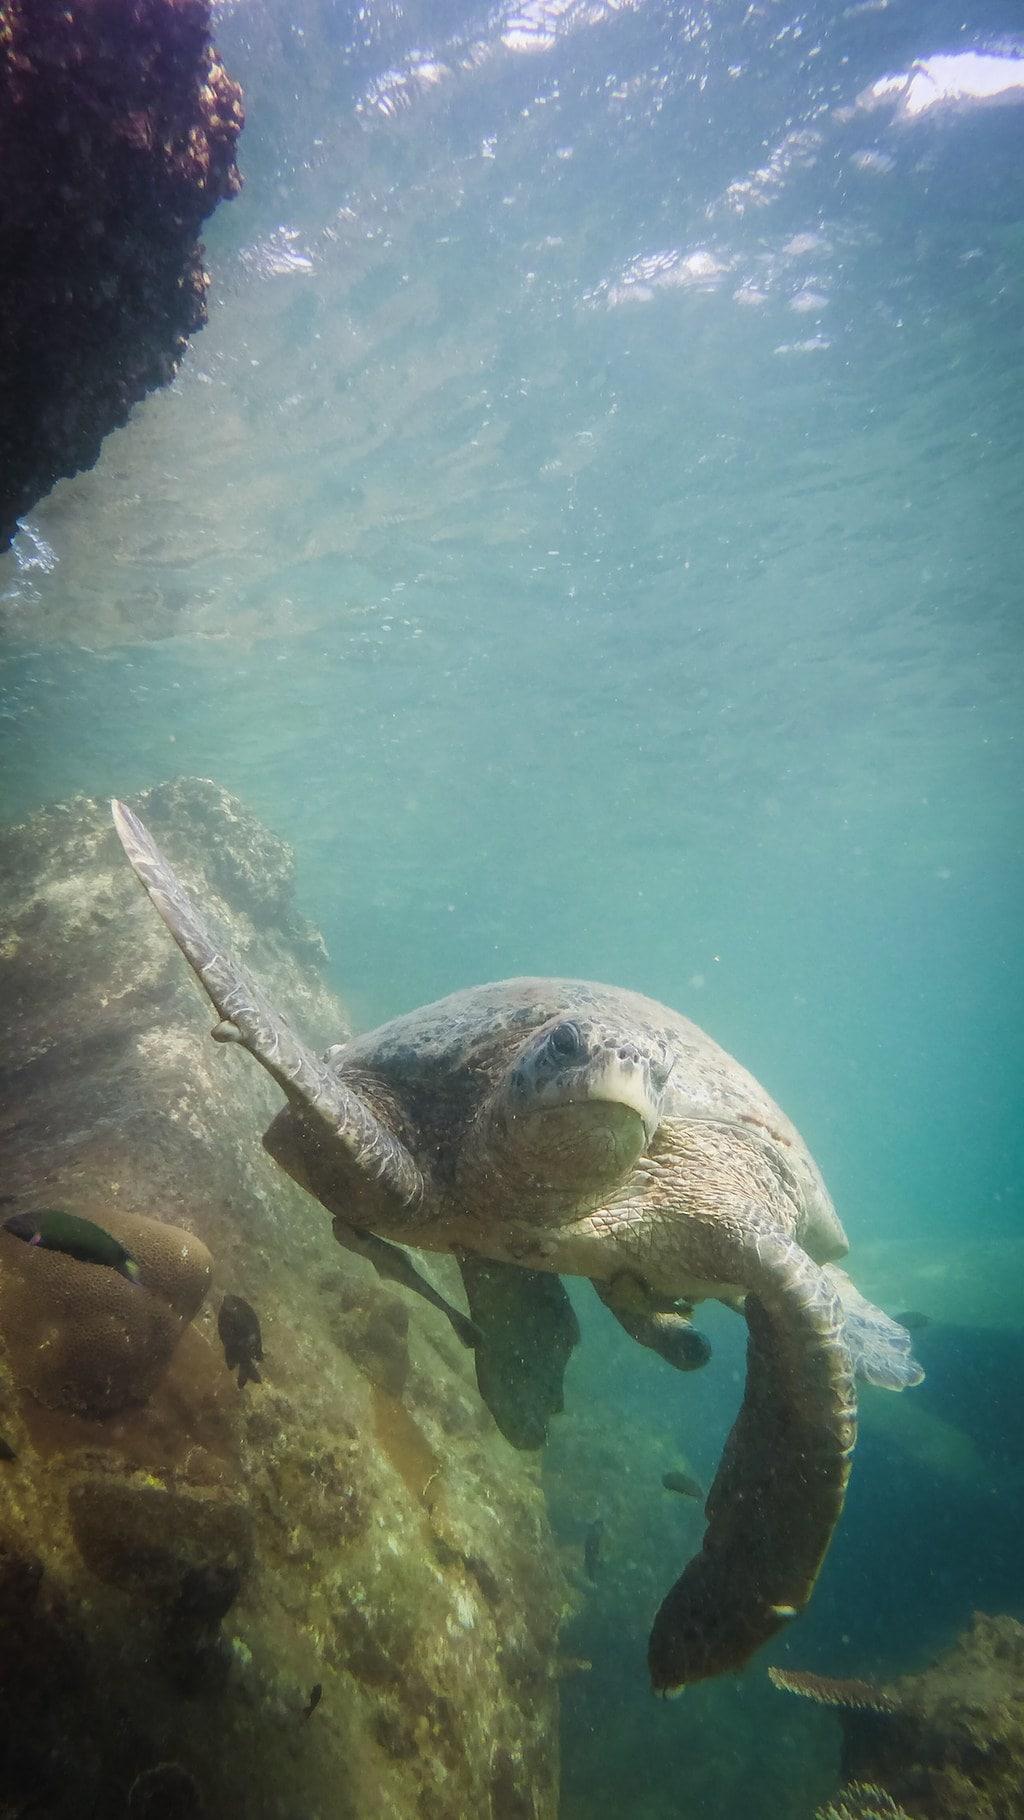 Gorgeous Hawkbill Turtle